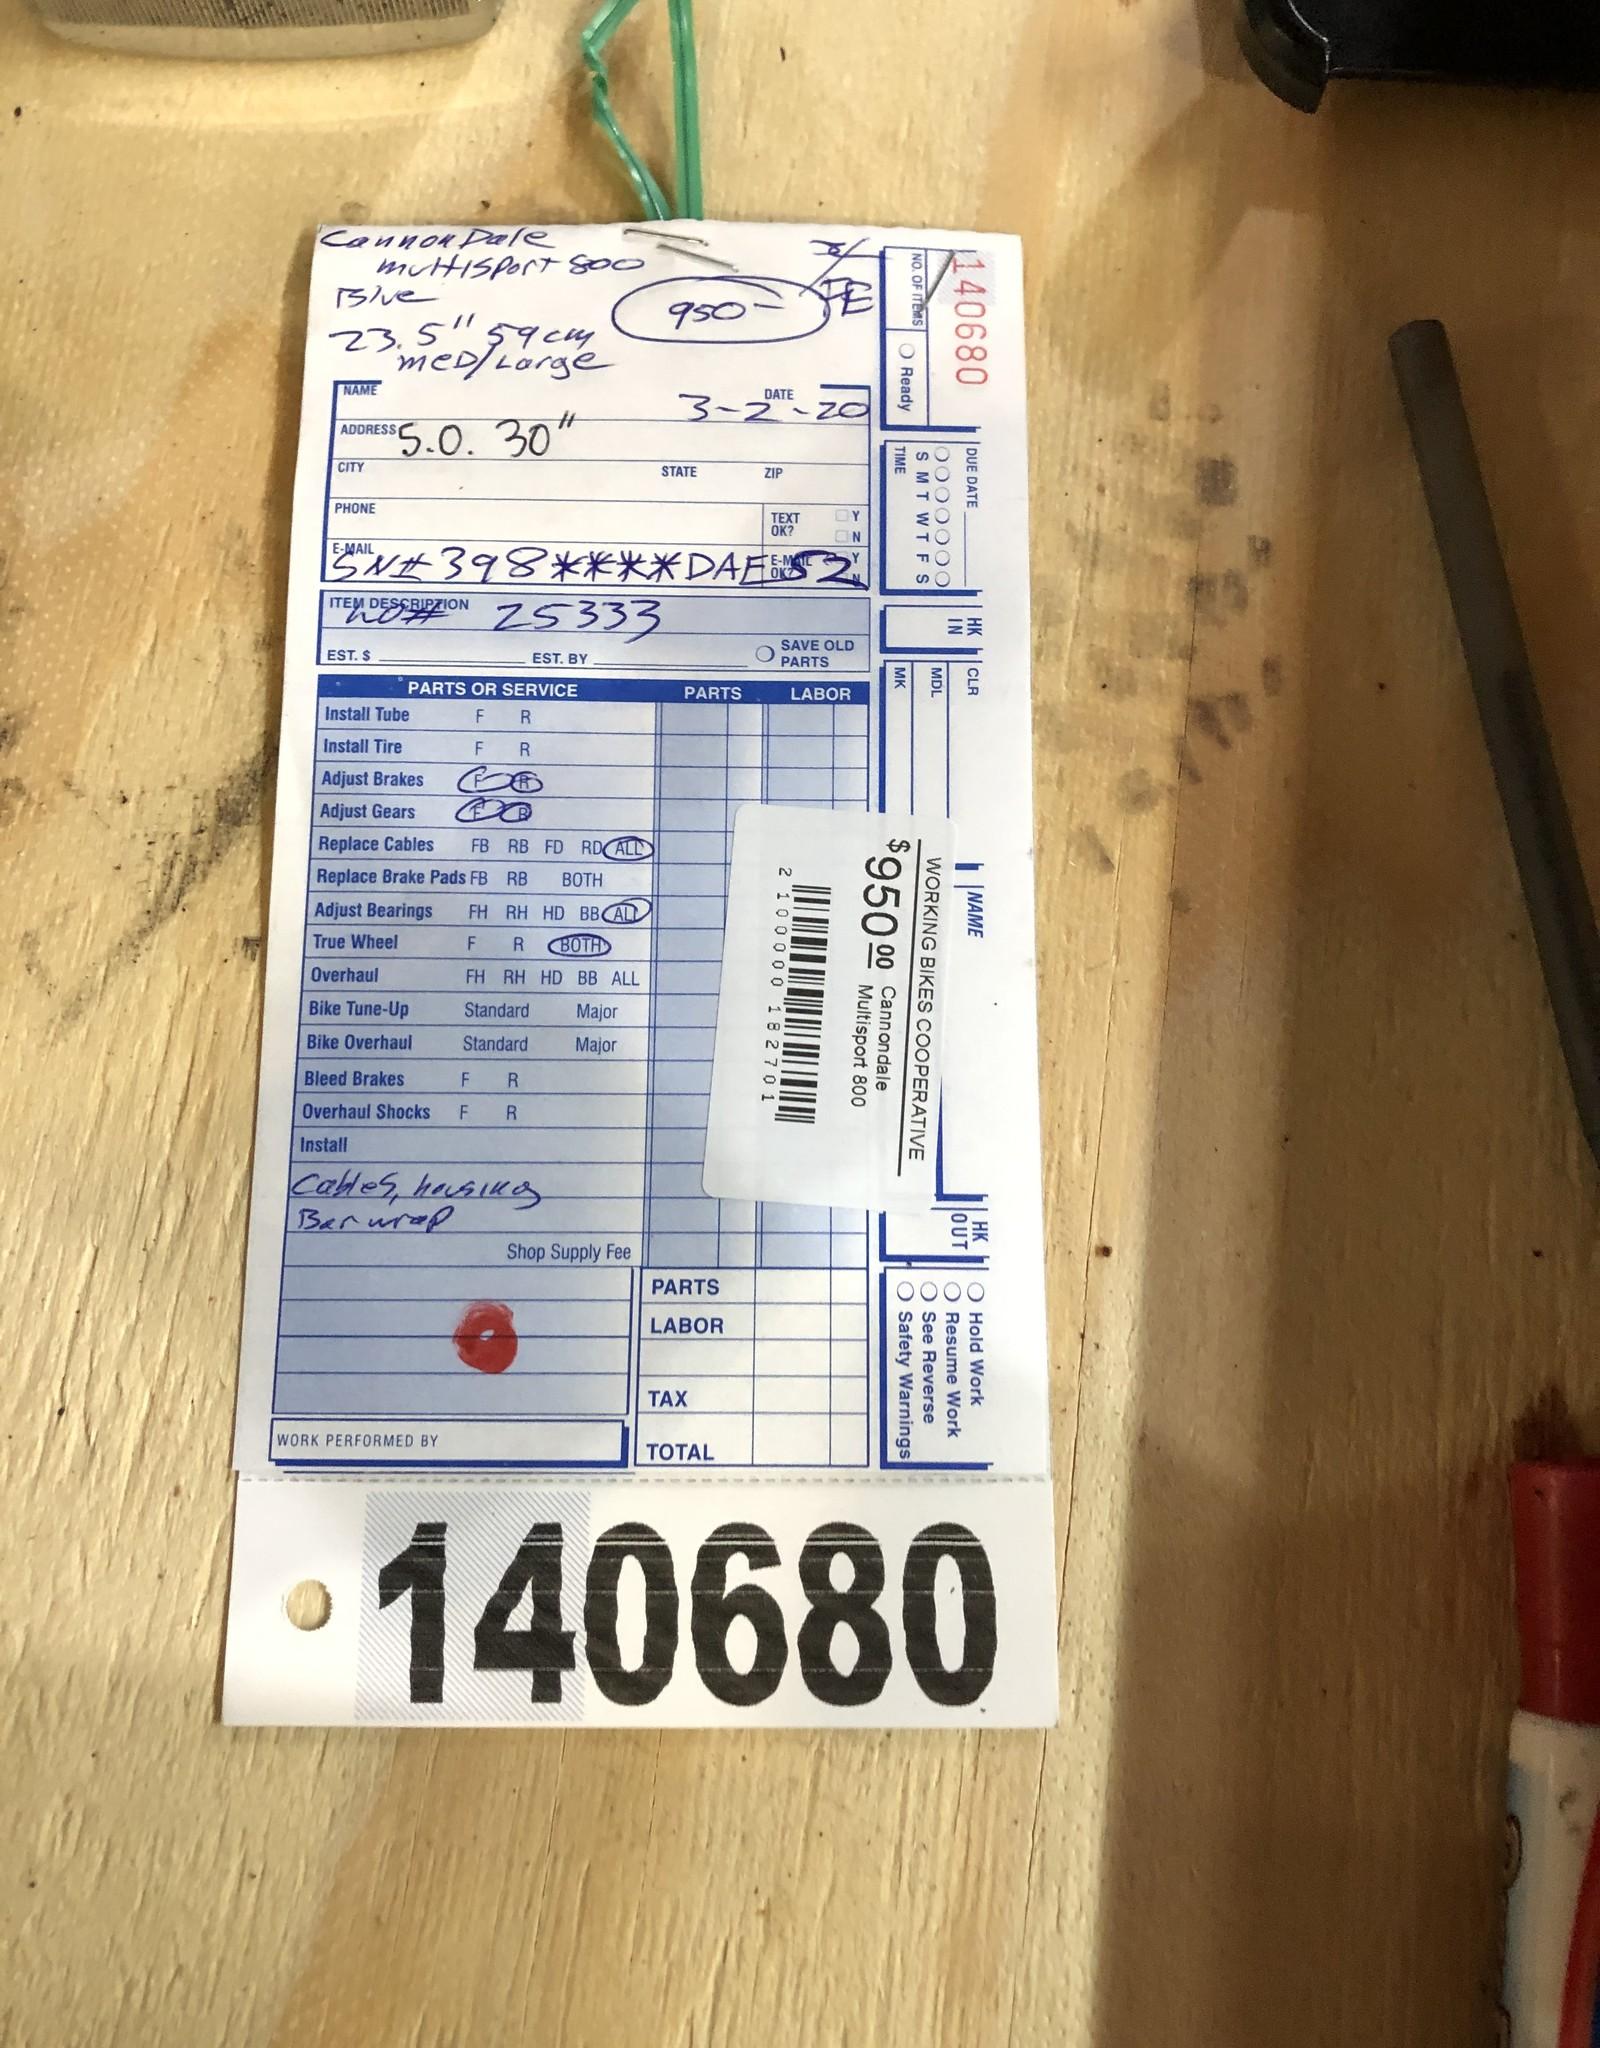 Cannondale 59cm Cannondale Multisport 800 (AE52)